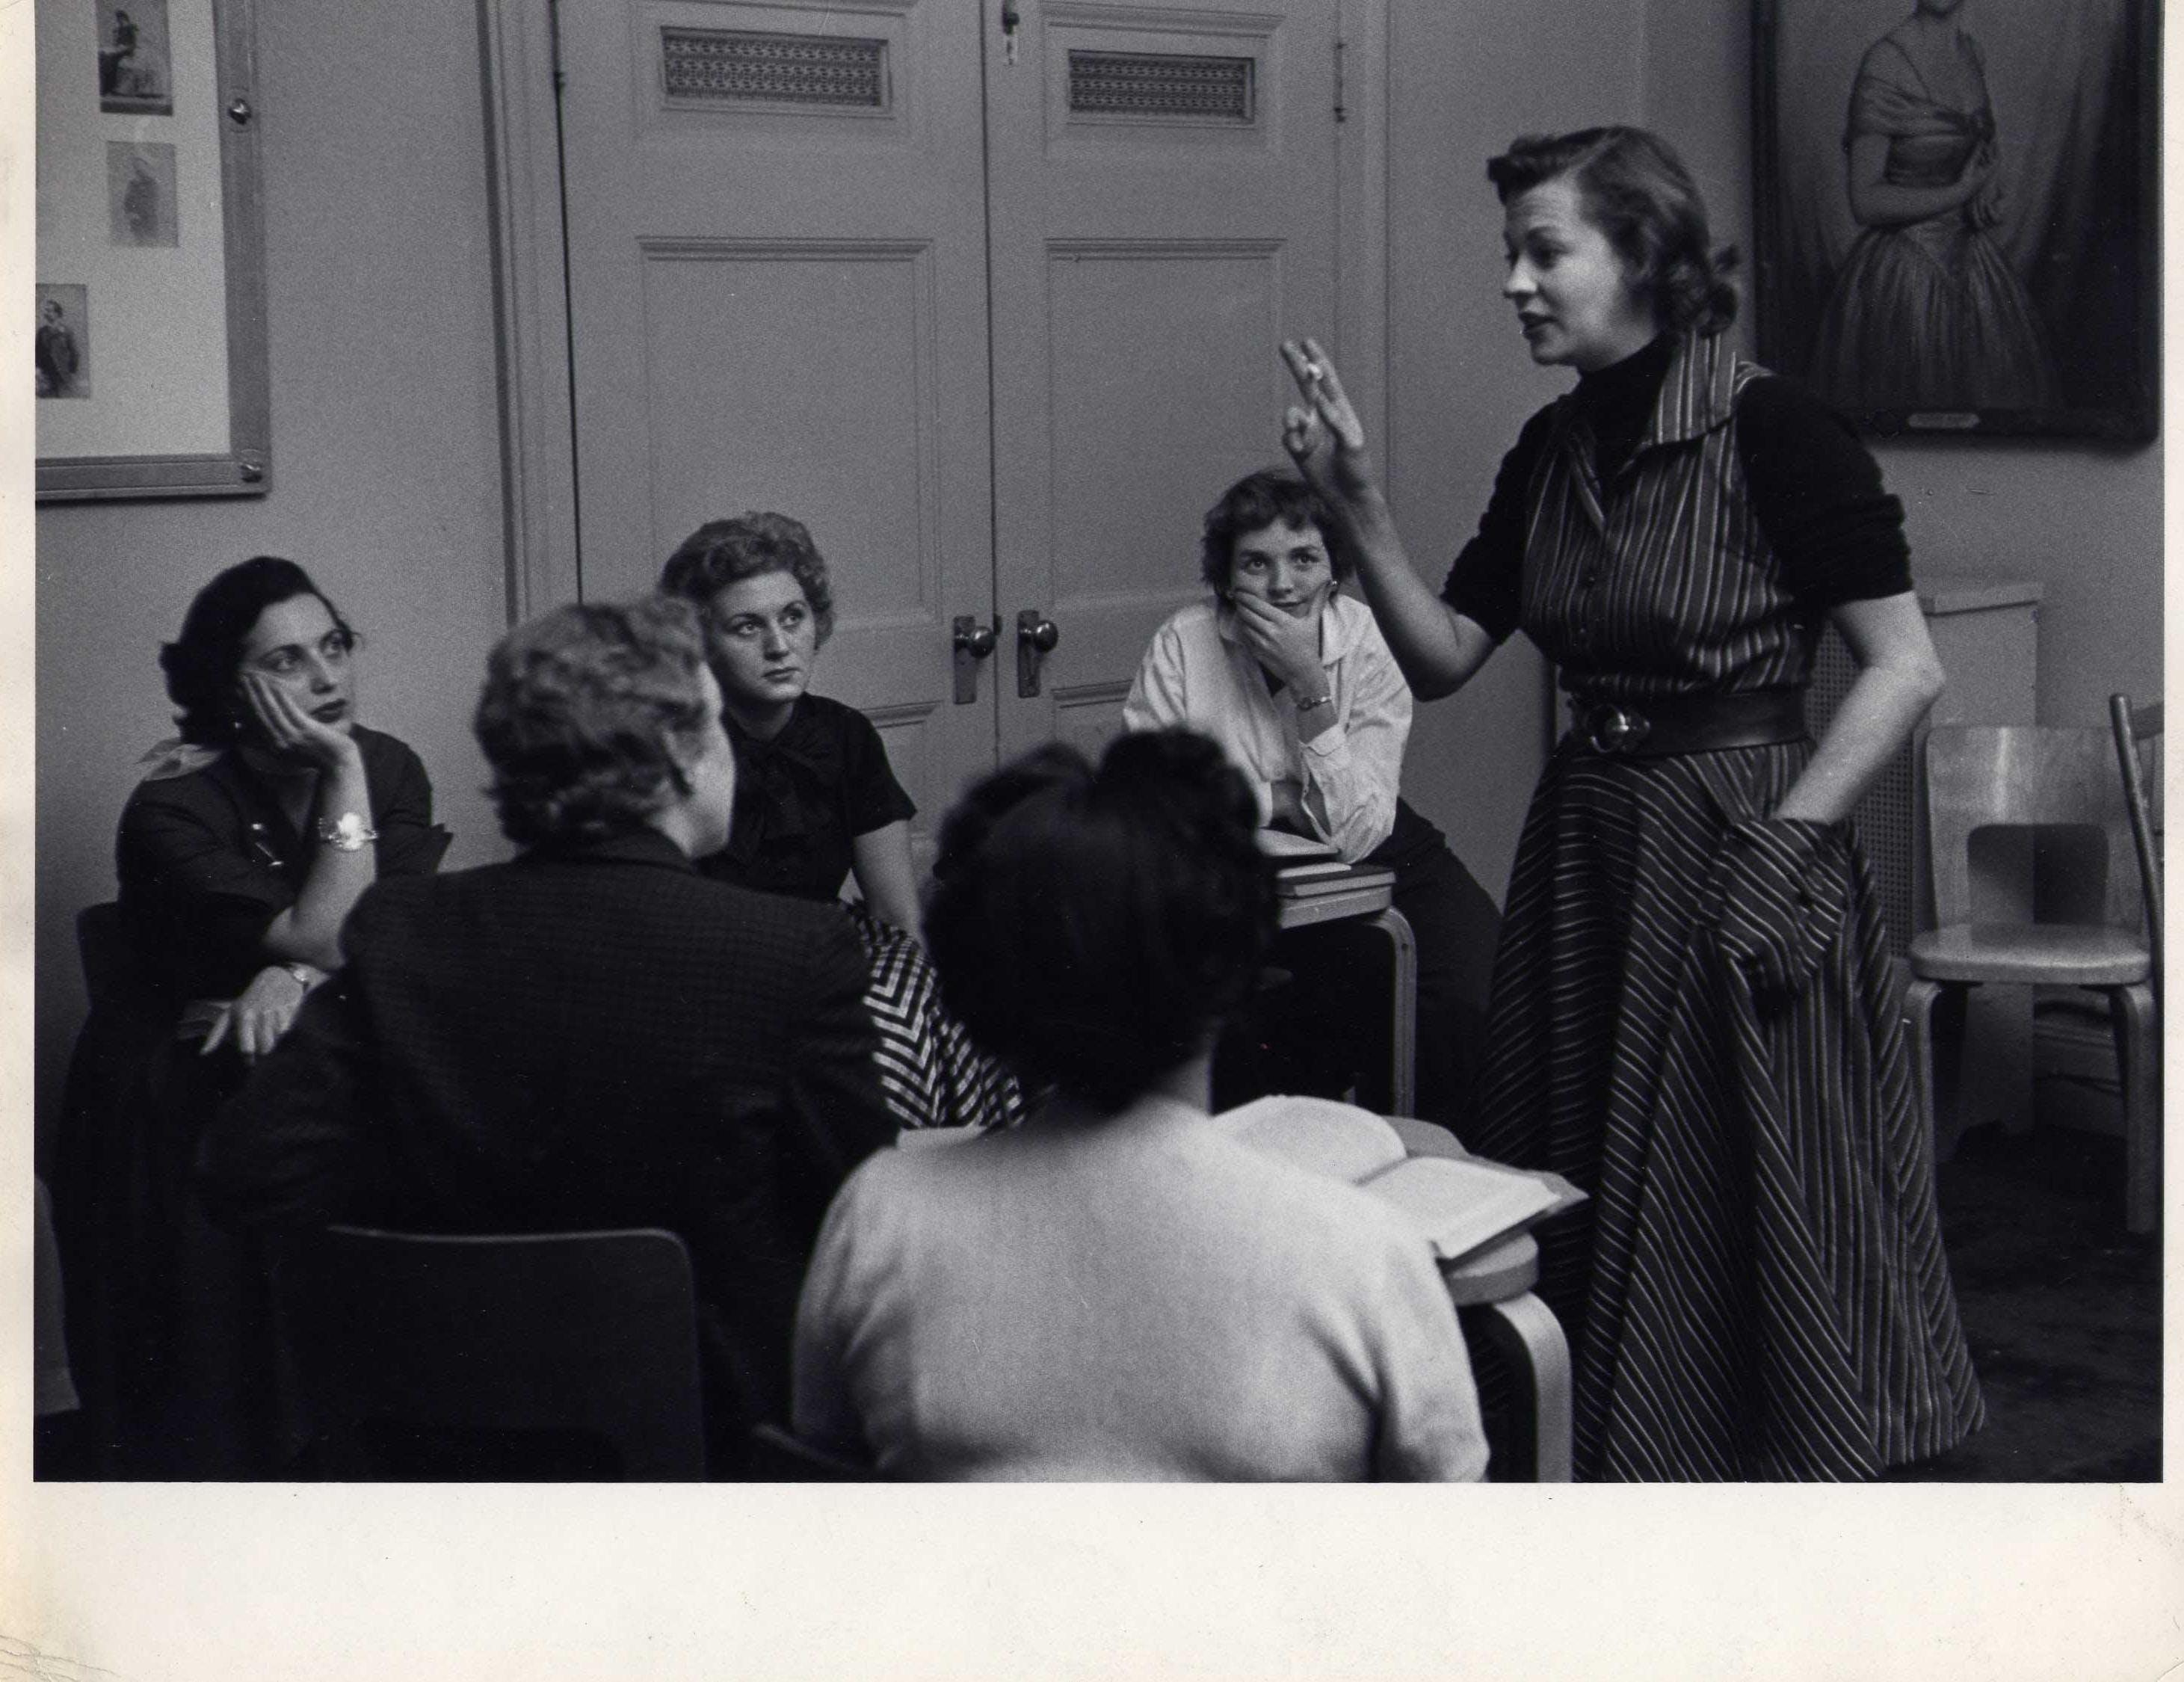 Public Conversation: Women's History is Ameri